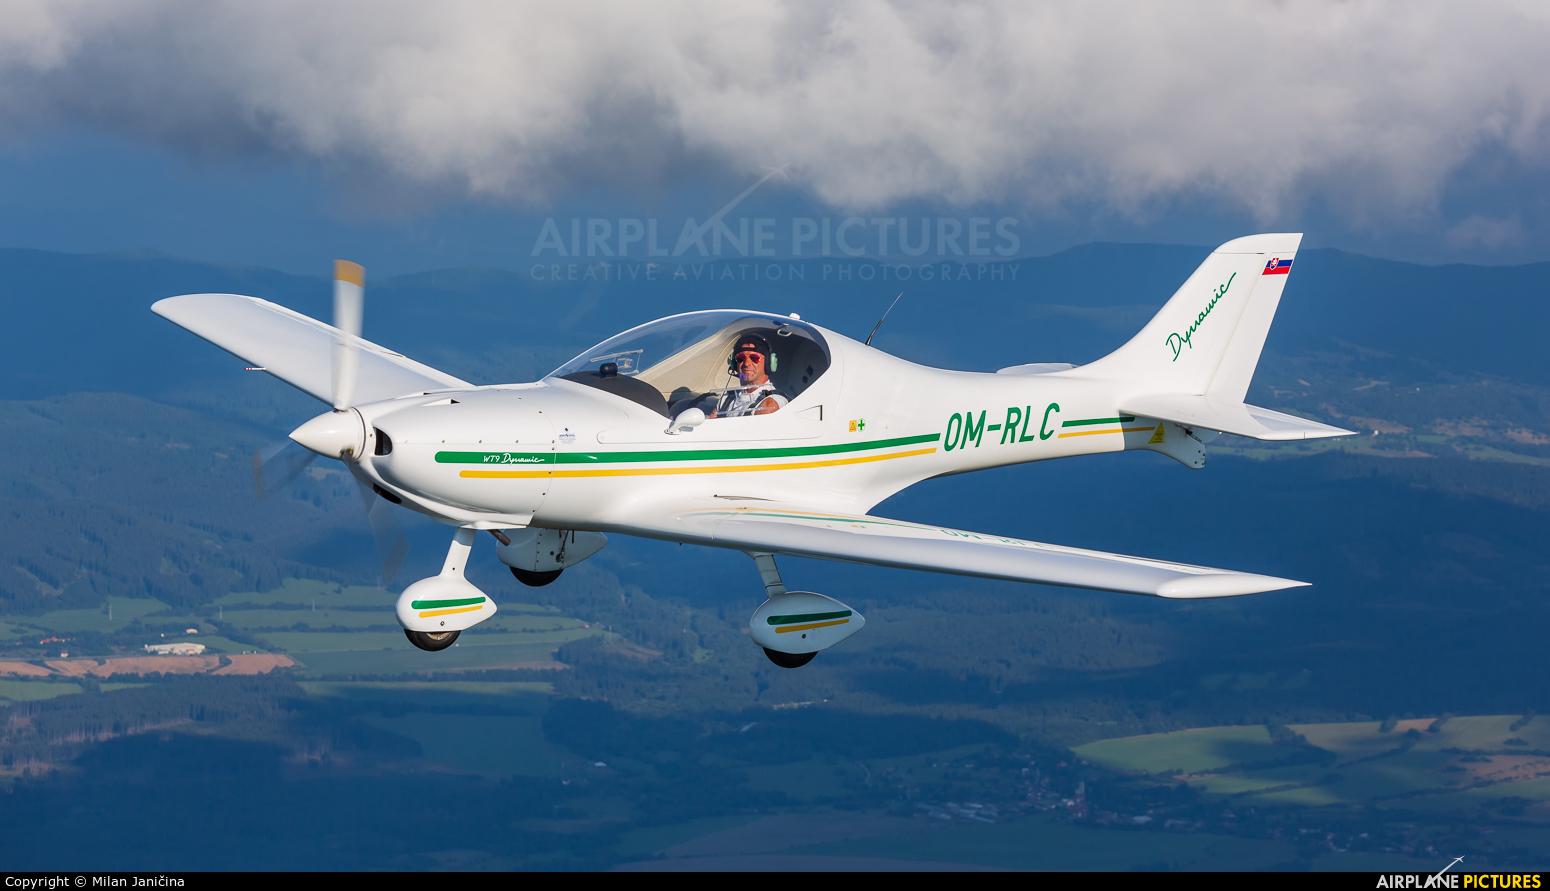 Slovensky Narodny Aeroklub OM-RLC aircraft at In Flight - Slovakia